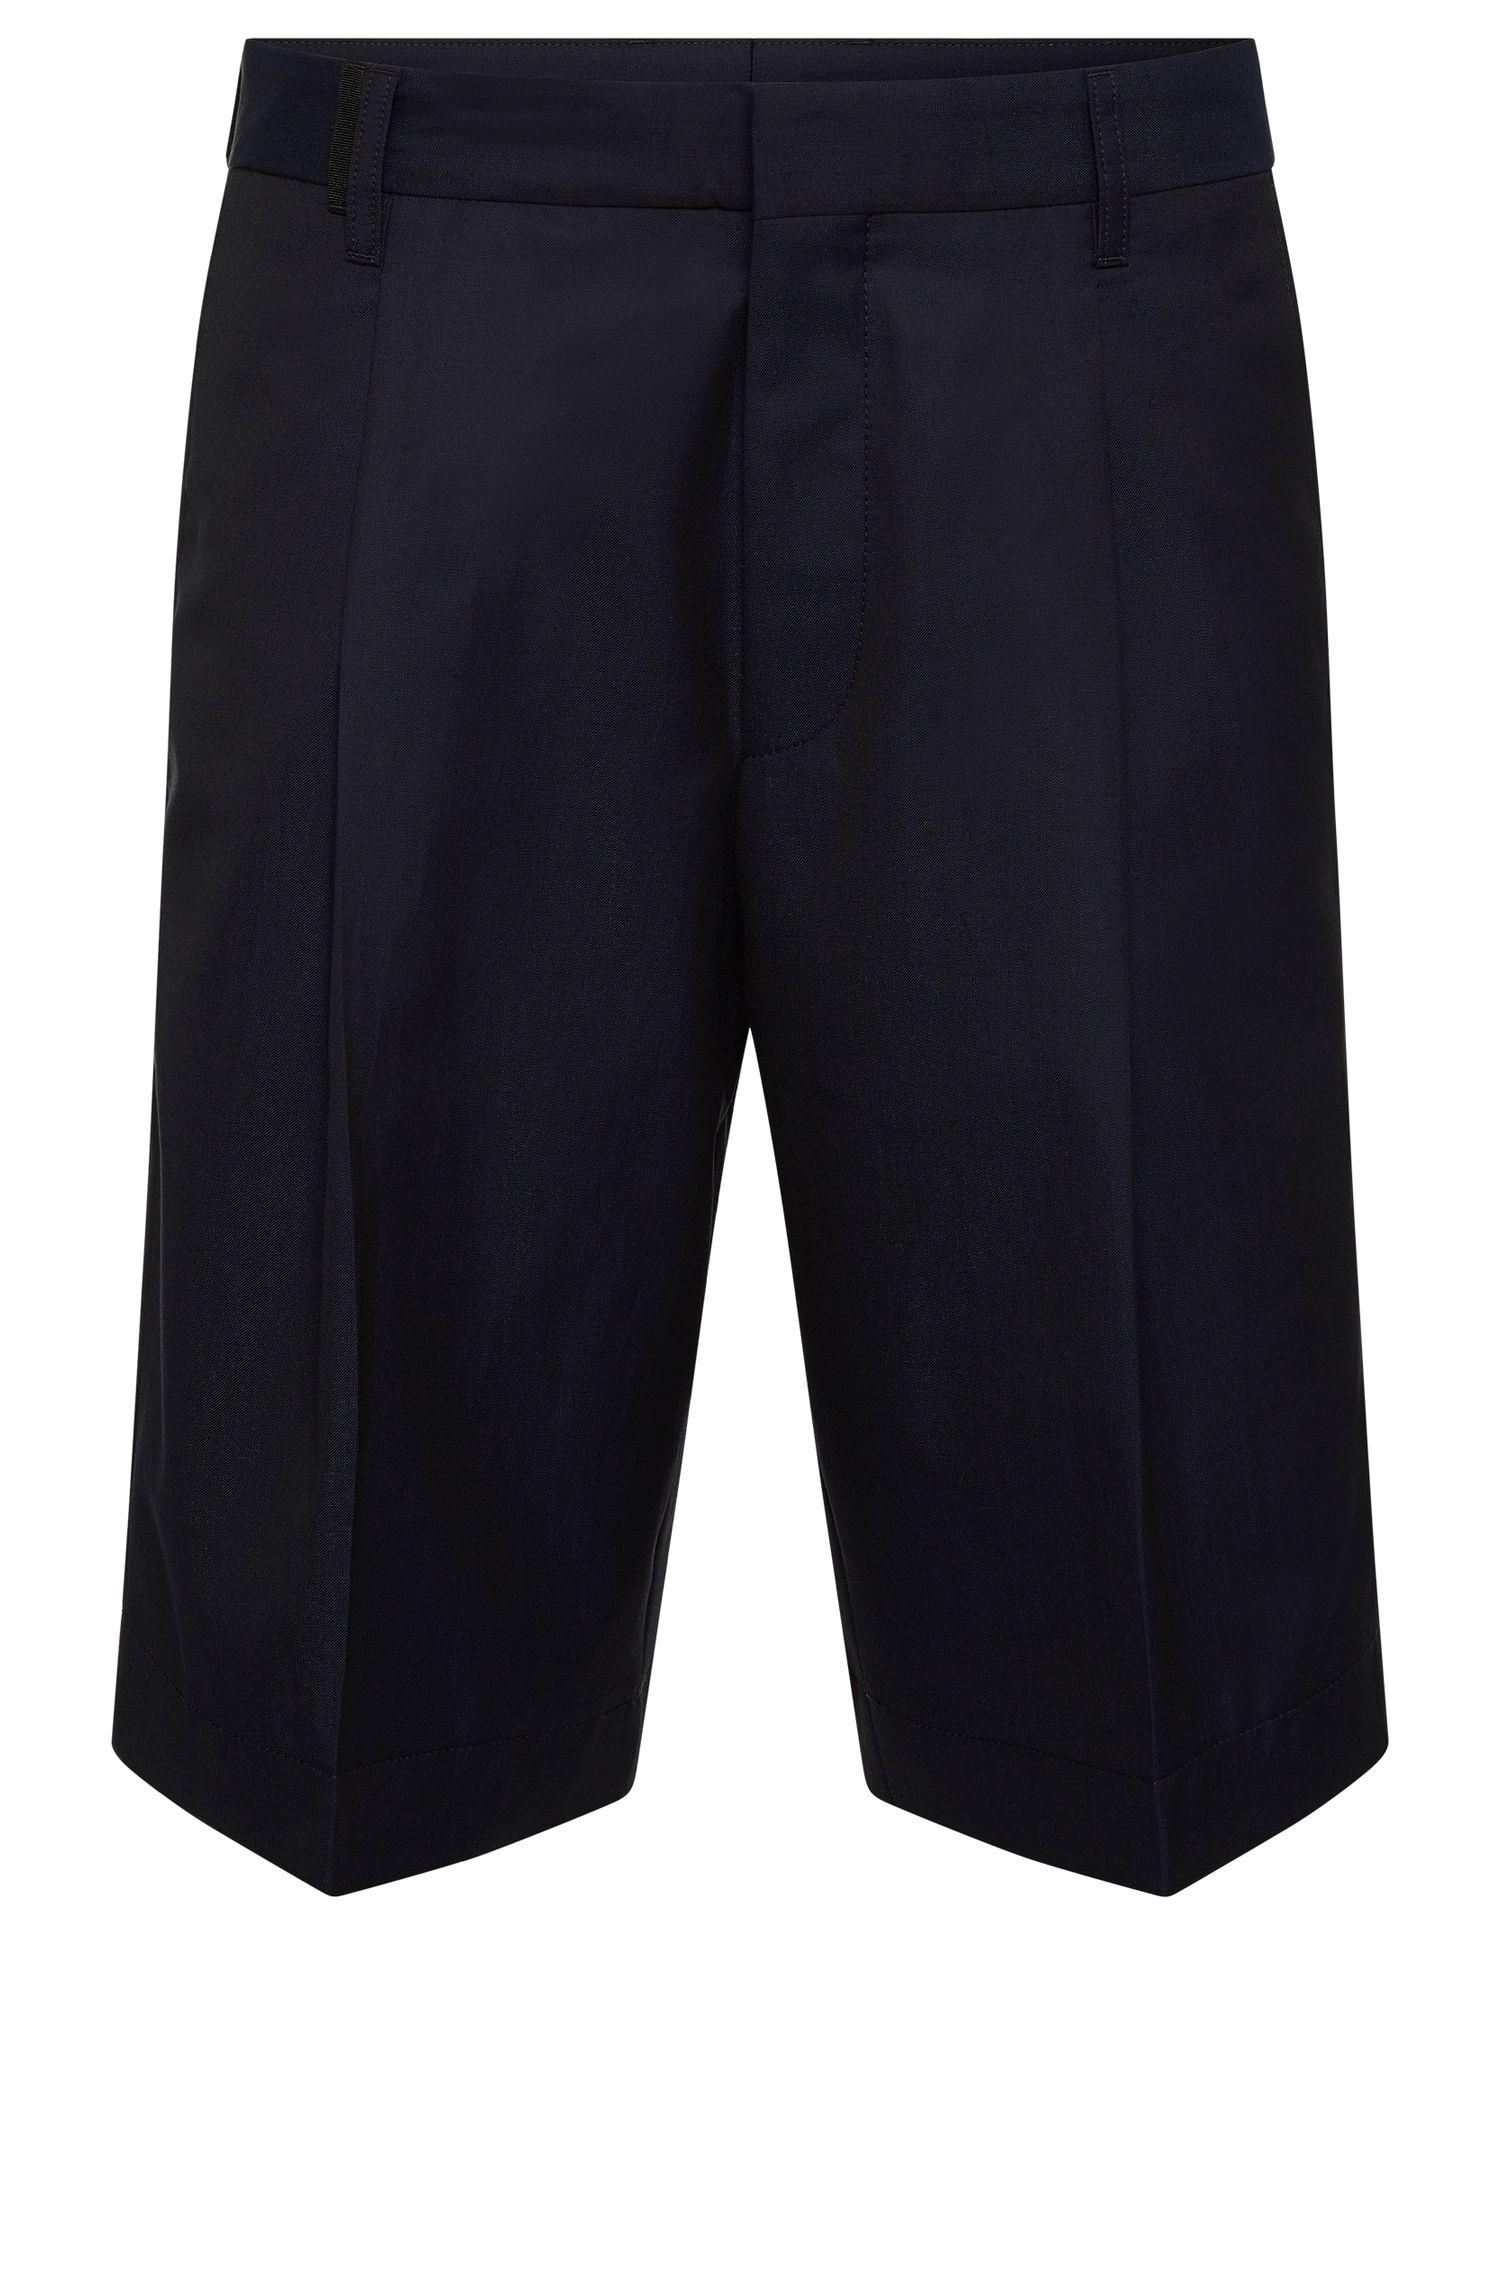 Shorts relaxed fit en mezcla de lana virgen con algodón: 'Himon'